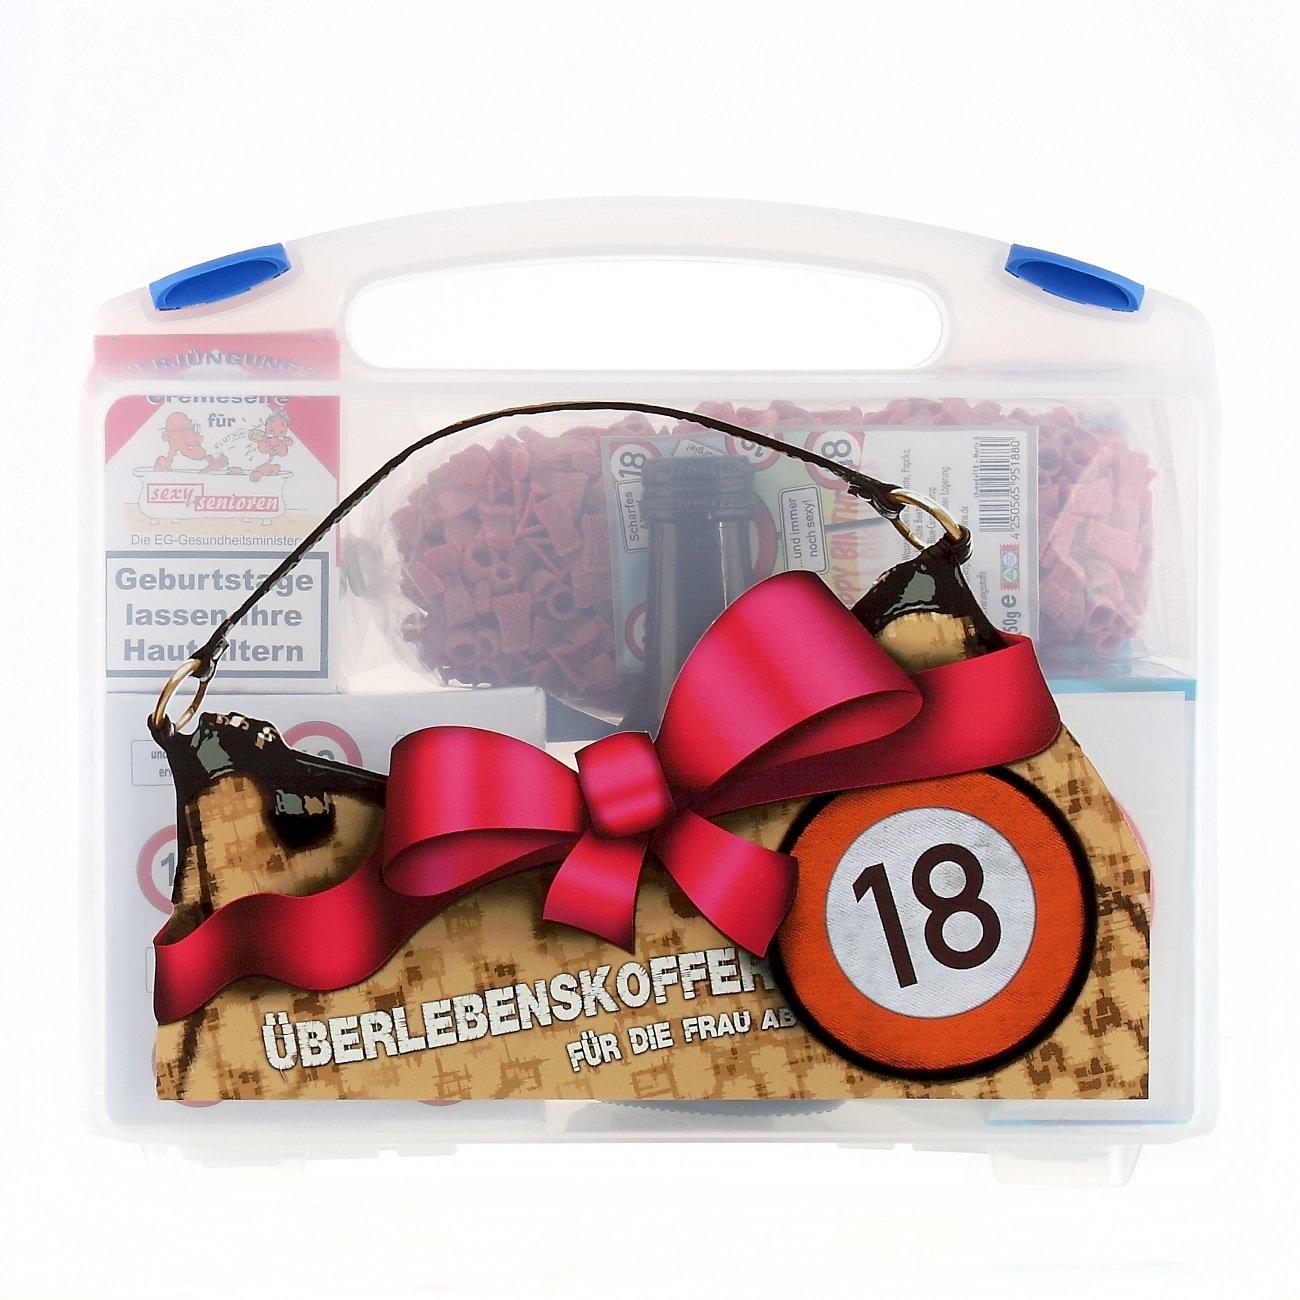 Lustige Apotheke Überlebenskoffer für die junge Frau ab 18 (8 teilig) Lustapotheke®